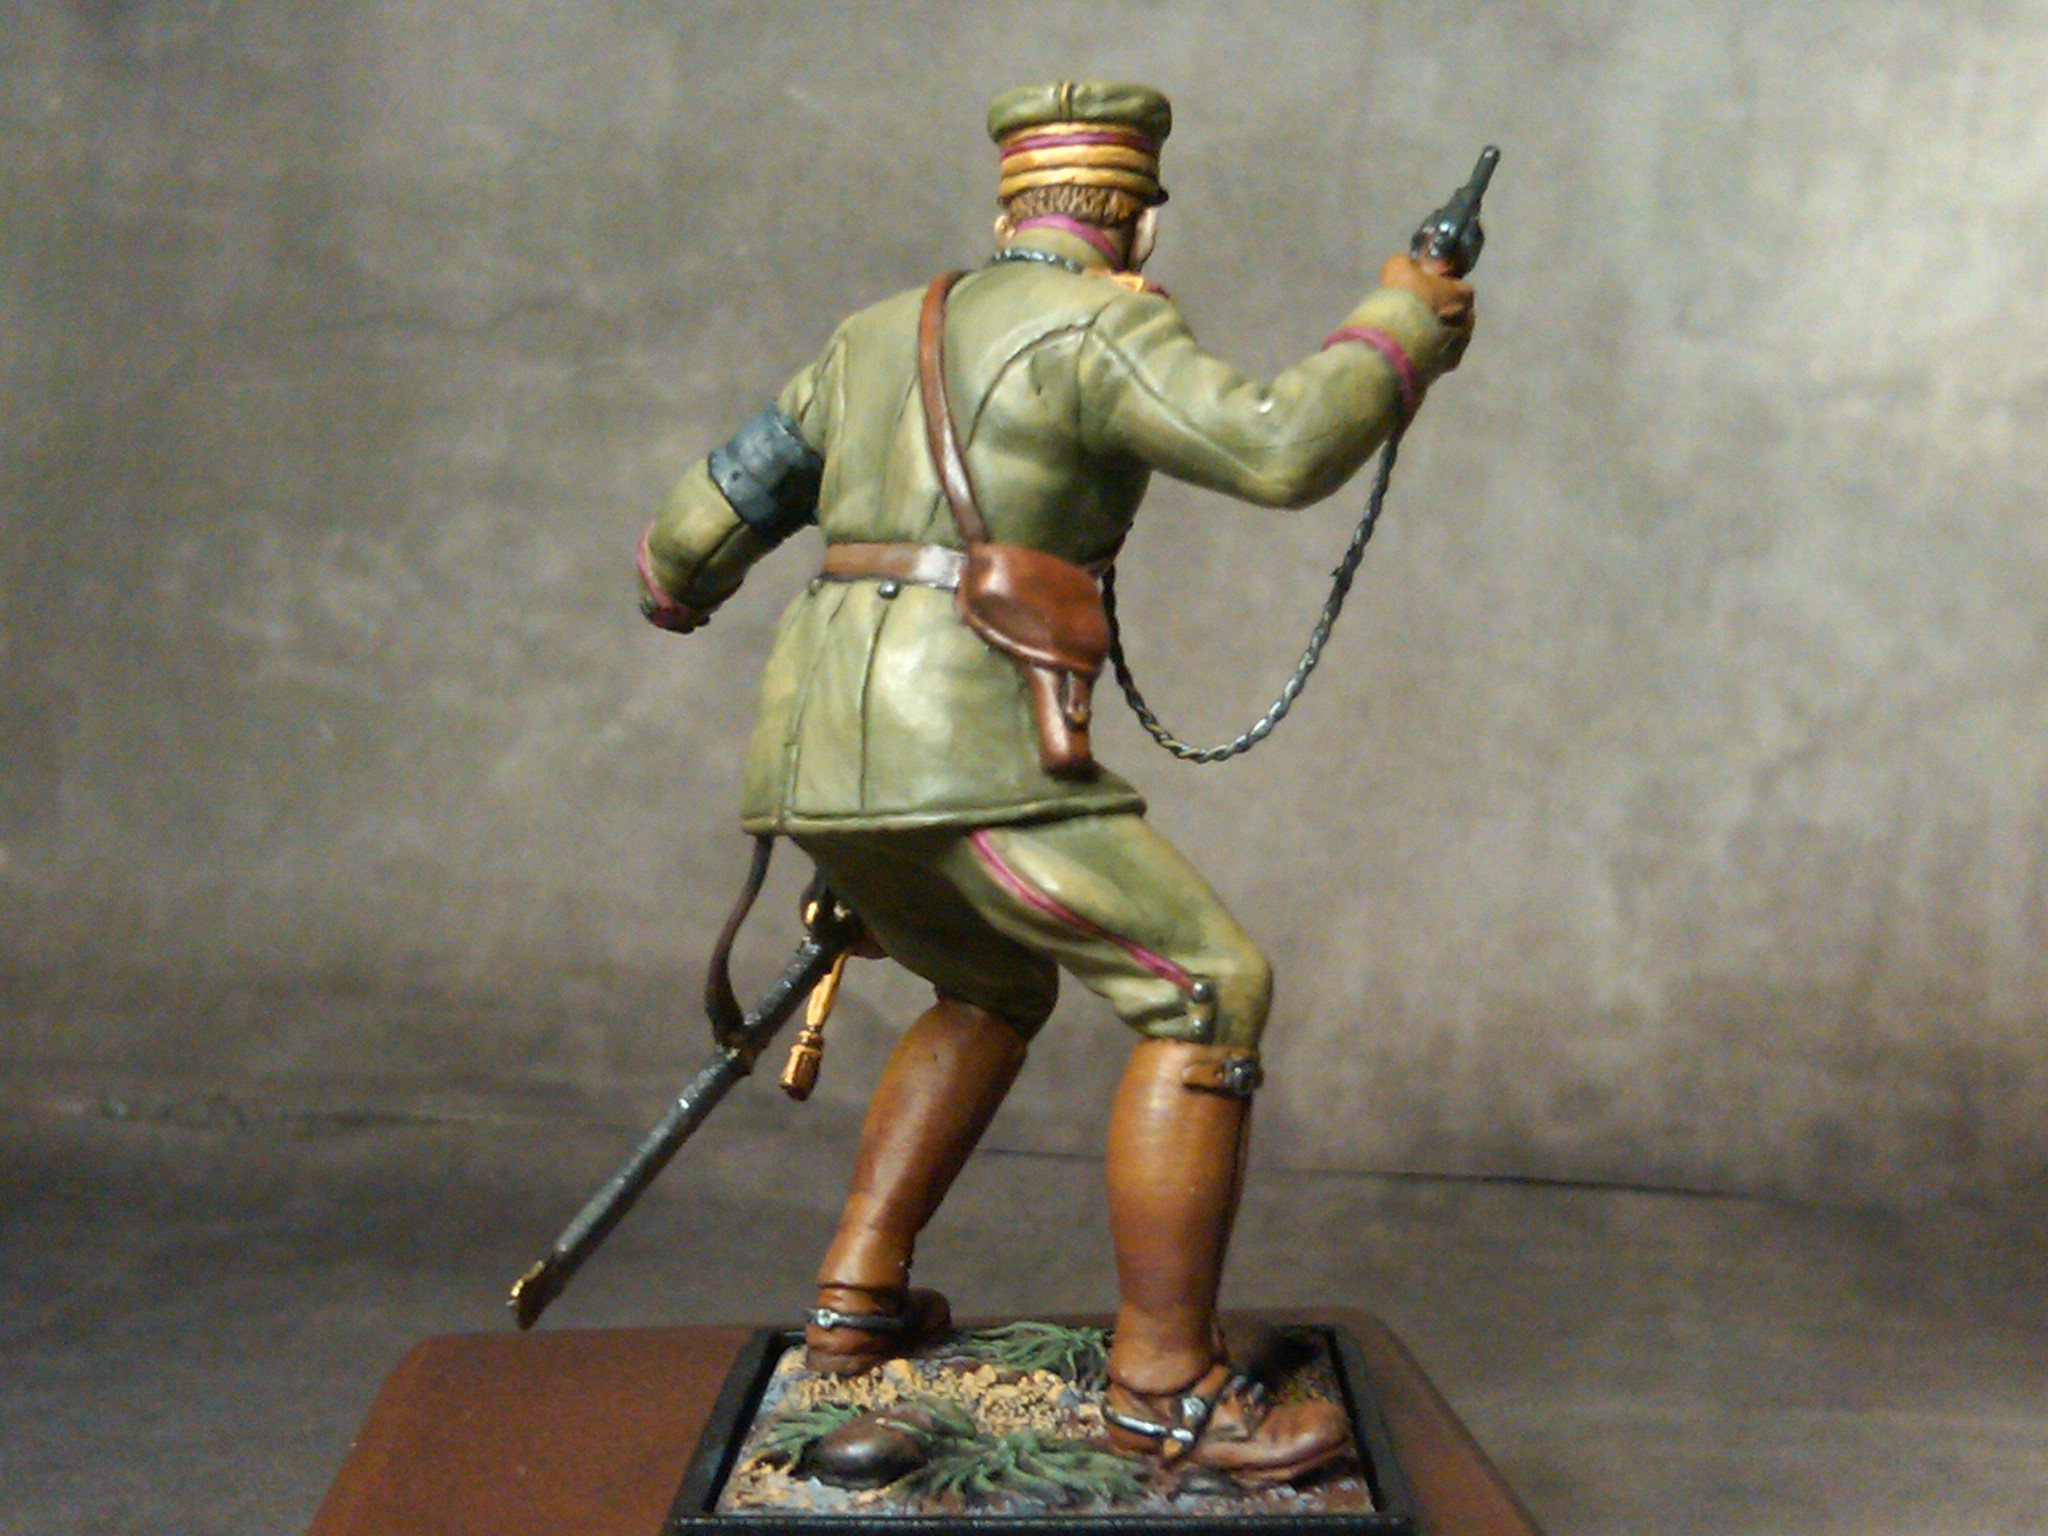 Major , Velissariou,Balkan Wars, 1912, miniature, Greekheroes, Βελισσαριου, Βαλκανικοί πόλεμοι, 1912, μινιατούρα, Greekheroes